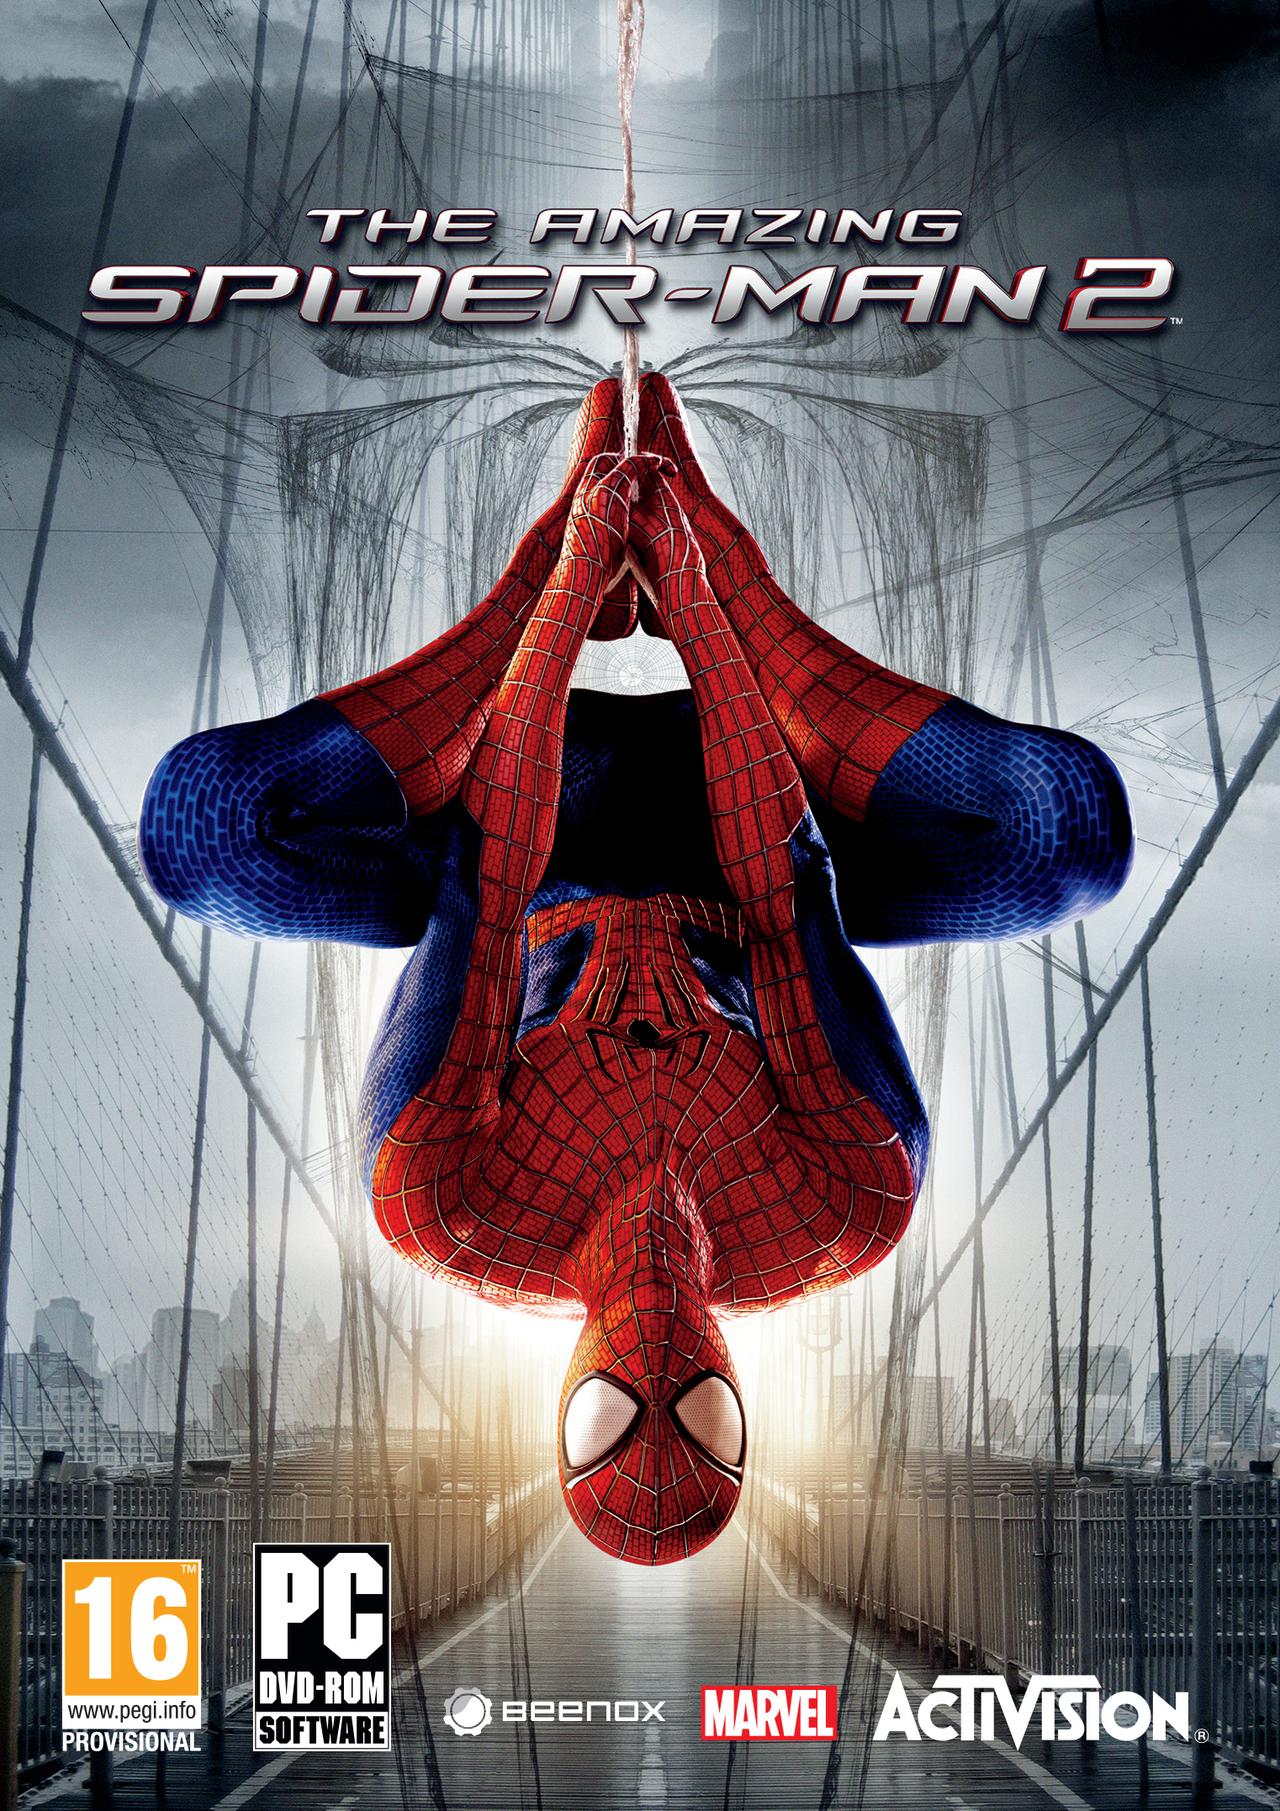 The Amazing Spider-Man 2-Reloaded 2014 |  تحميل لعبة Jaquette-the-amazing-spider-man-2-pc-cover-avant-g-1391118393